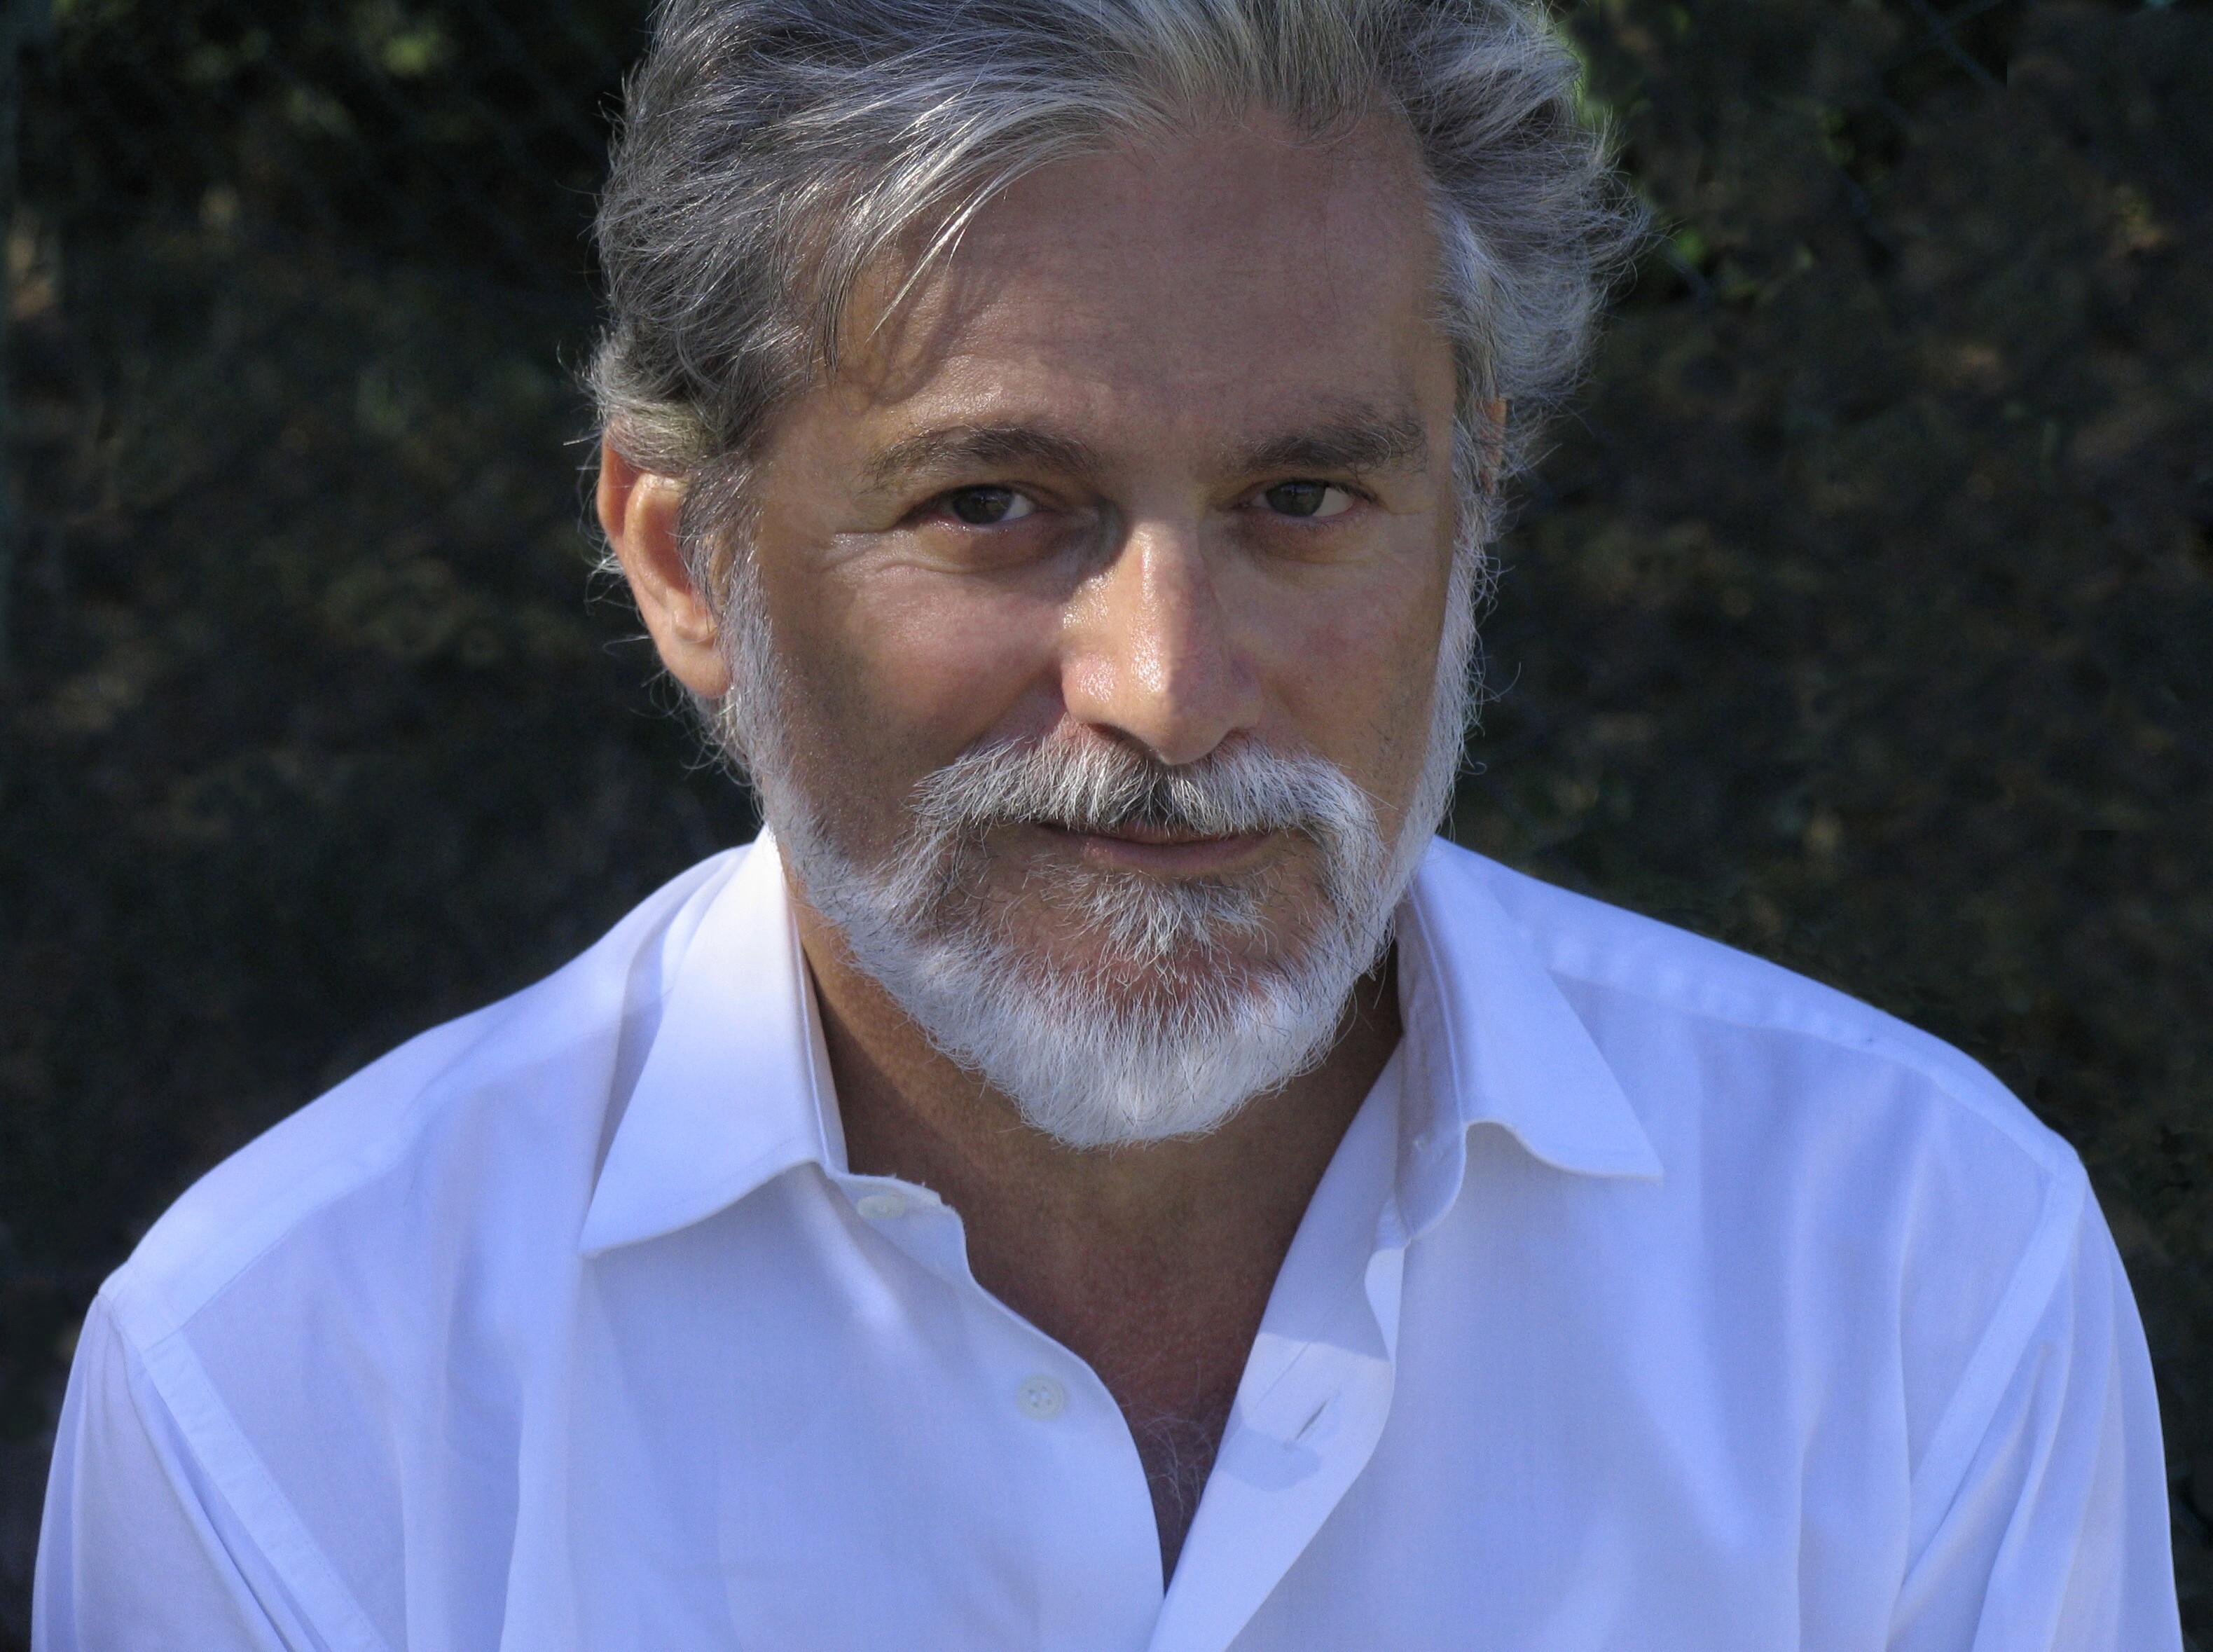 Roberto Net Worth